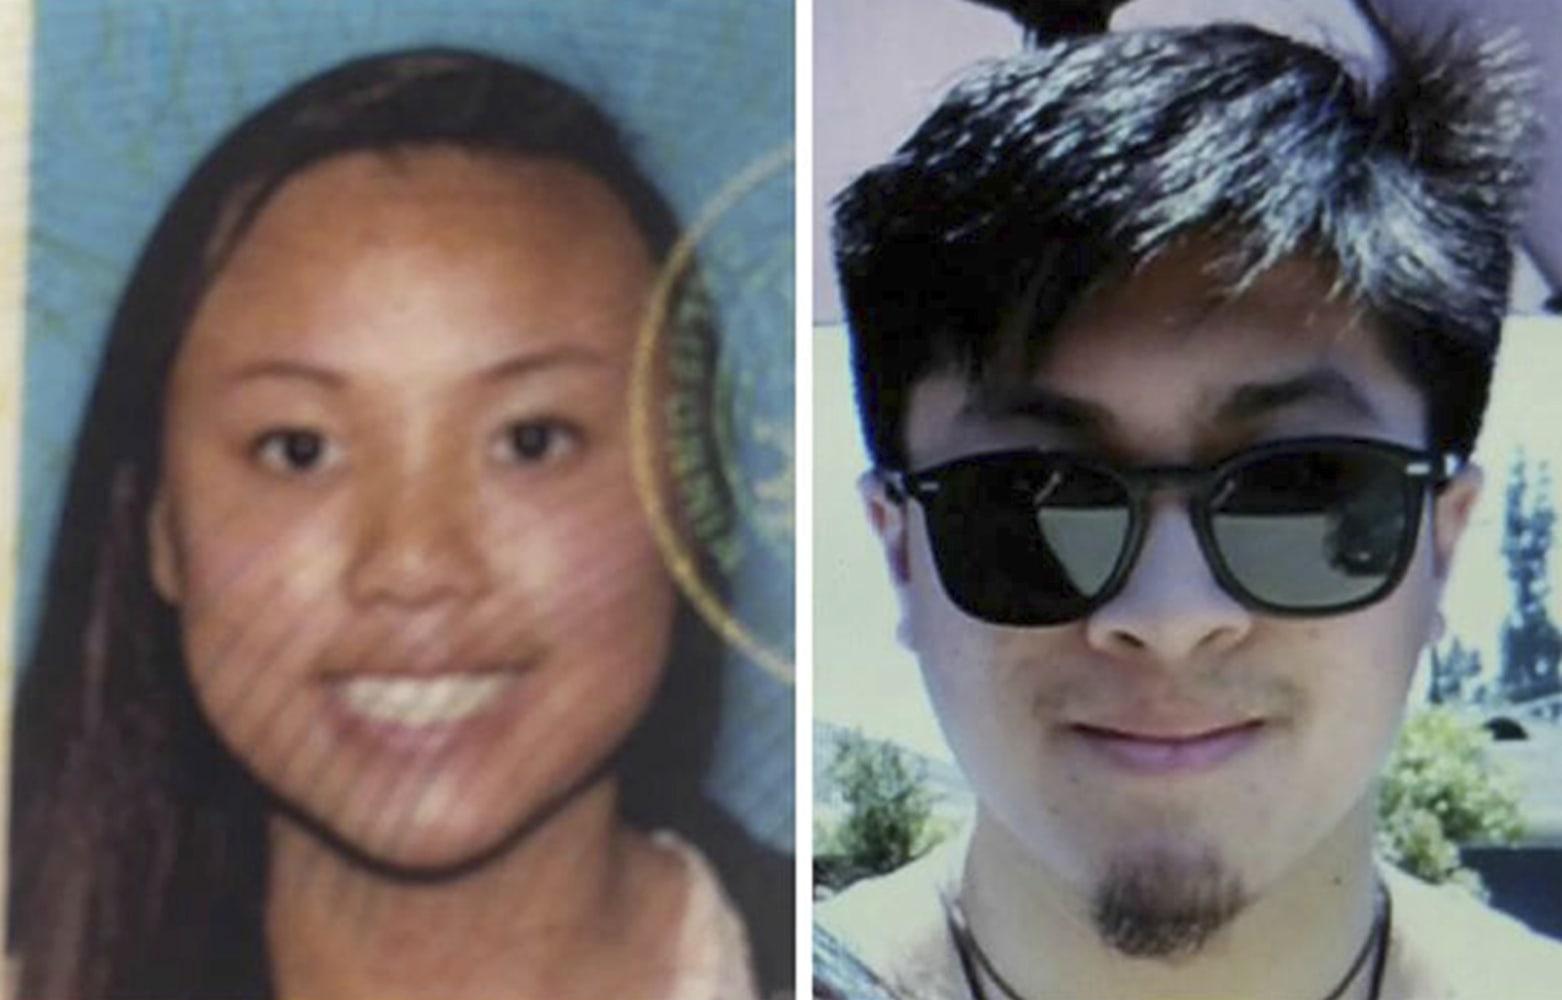 Off-duty security officer, girlfriend die in Sympathetic Murder-Suicide